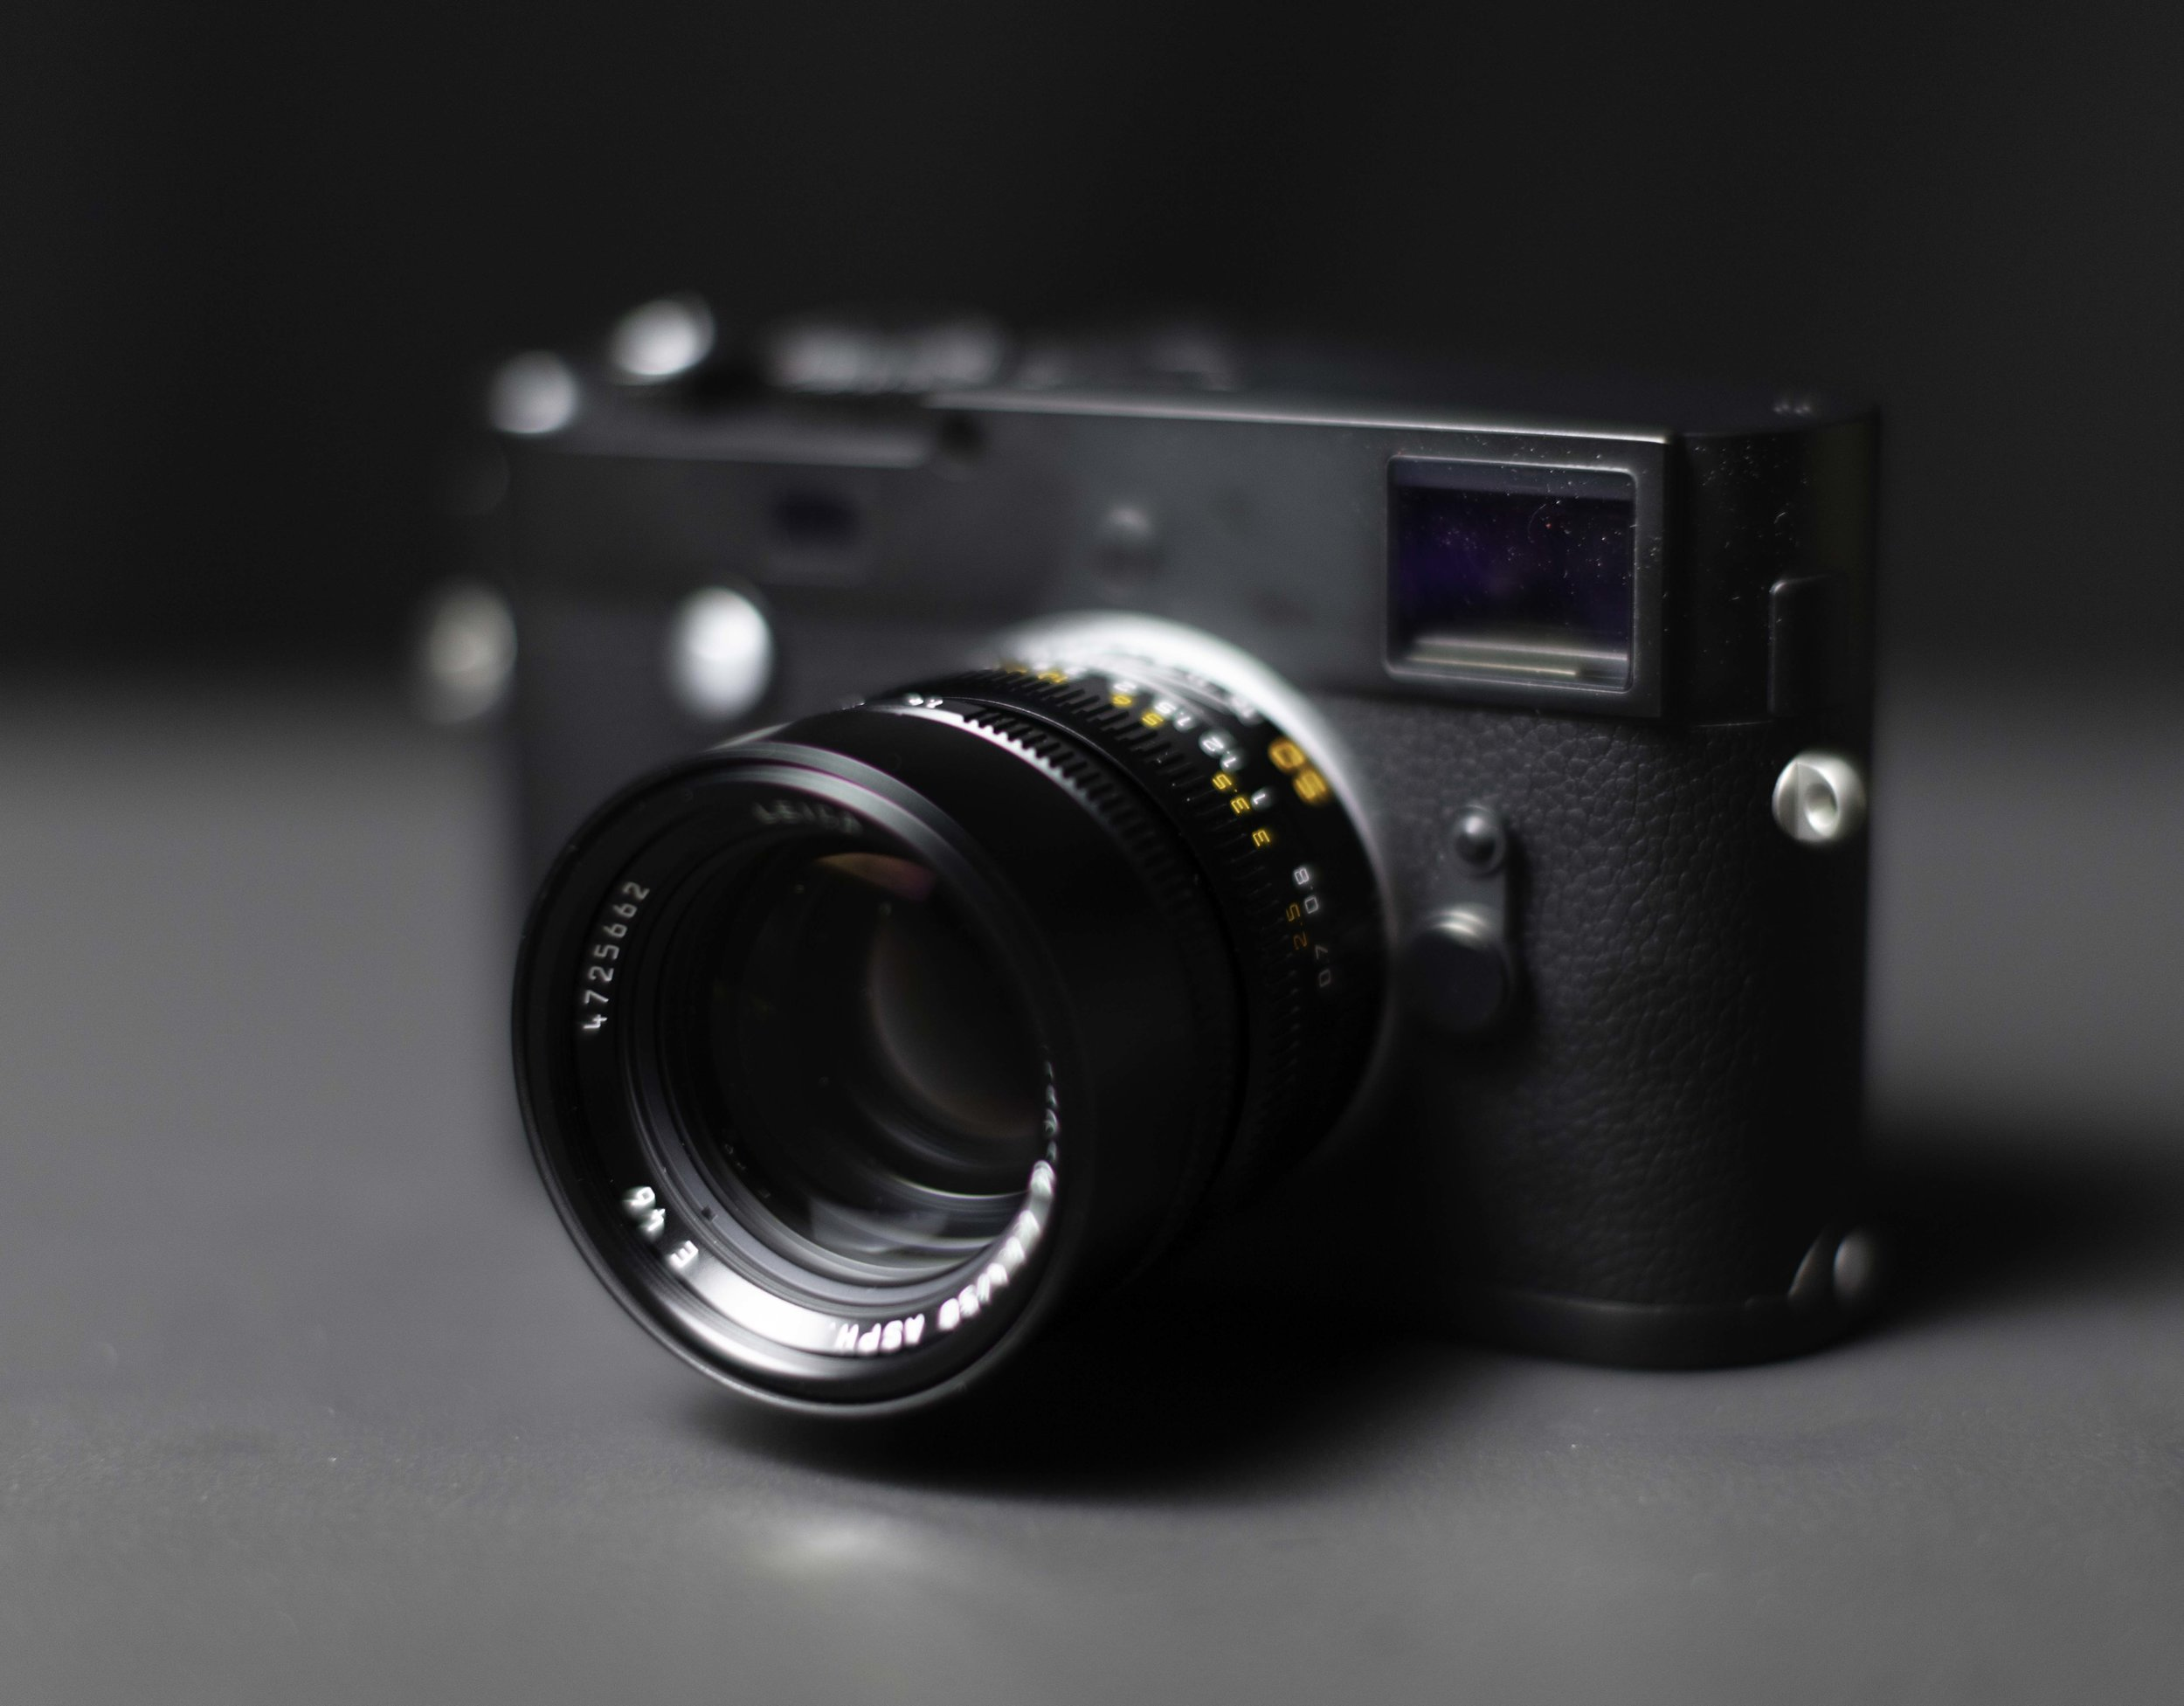 Leica - M Monochrom (Typ246)